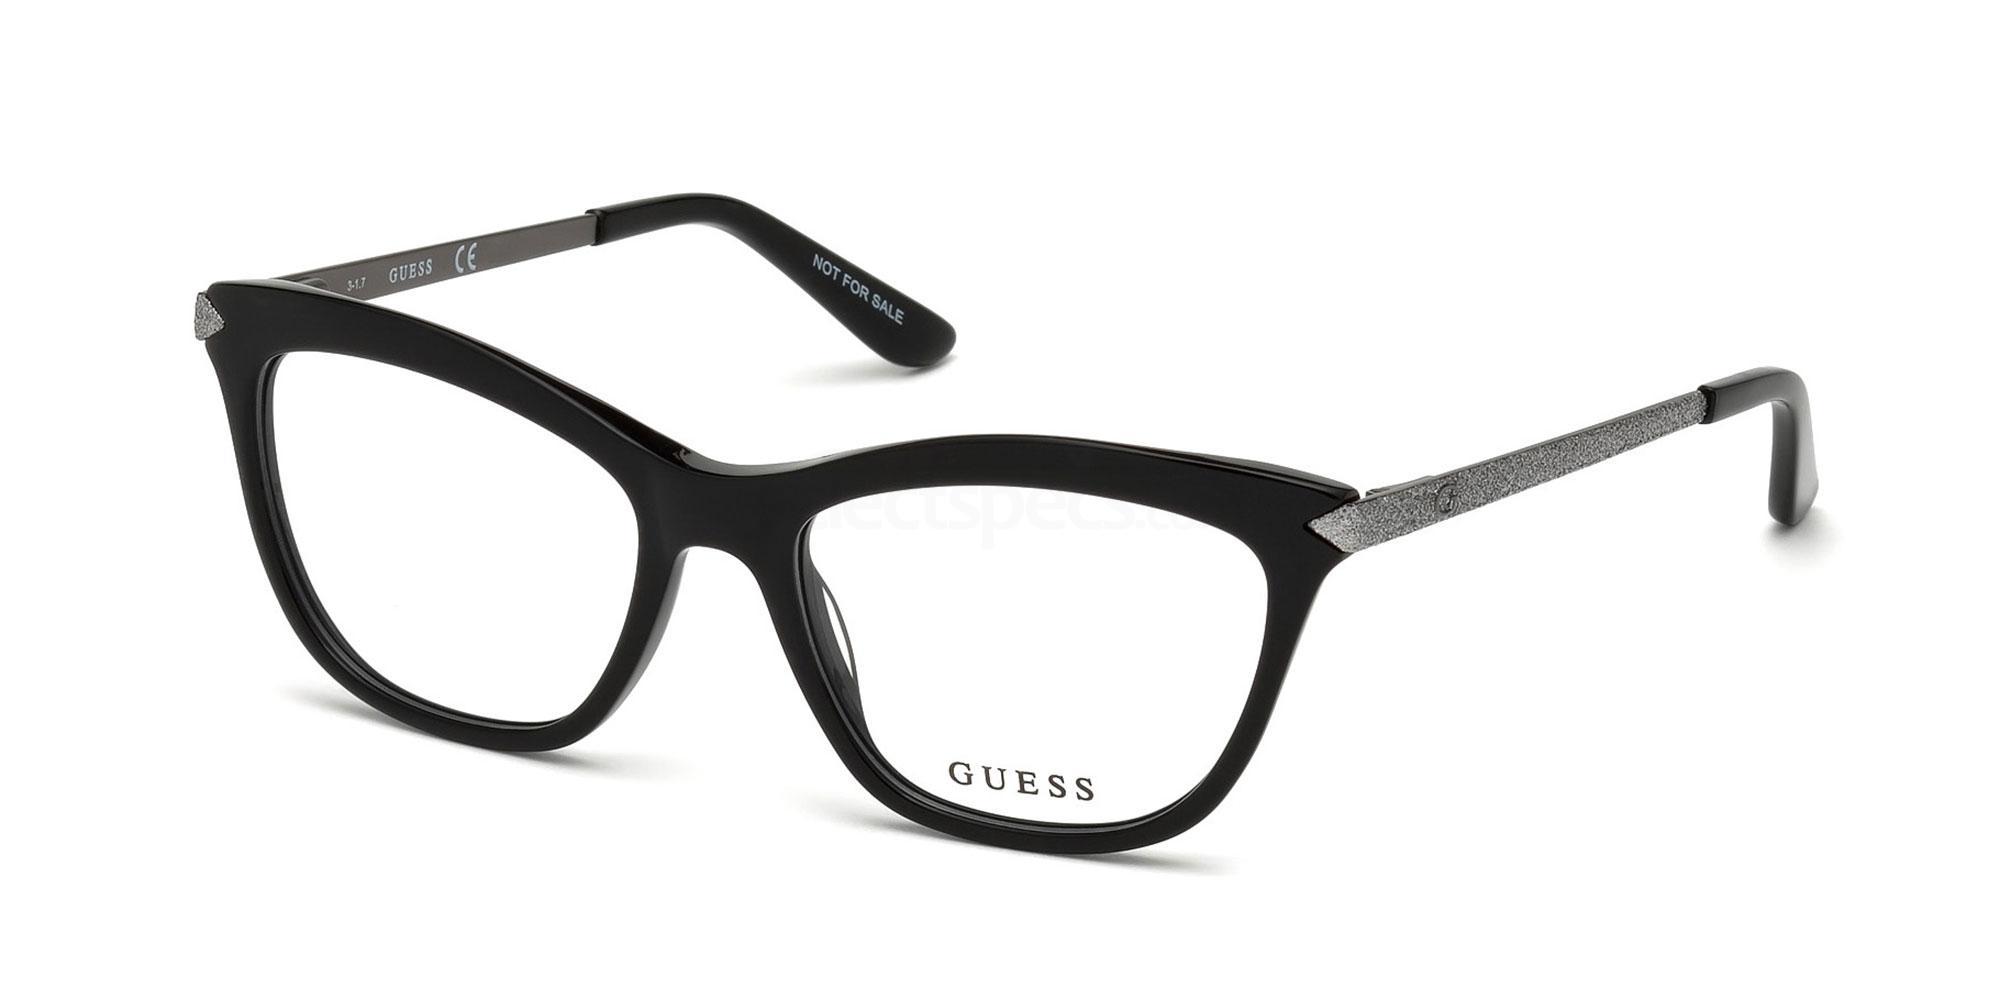 005 GU2655 Glasses, Guess